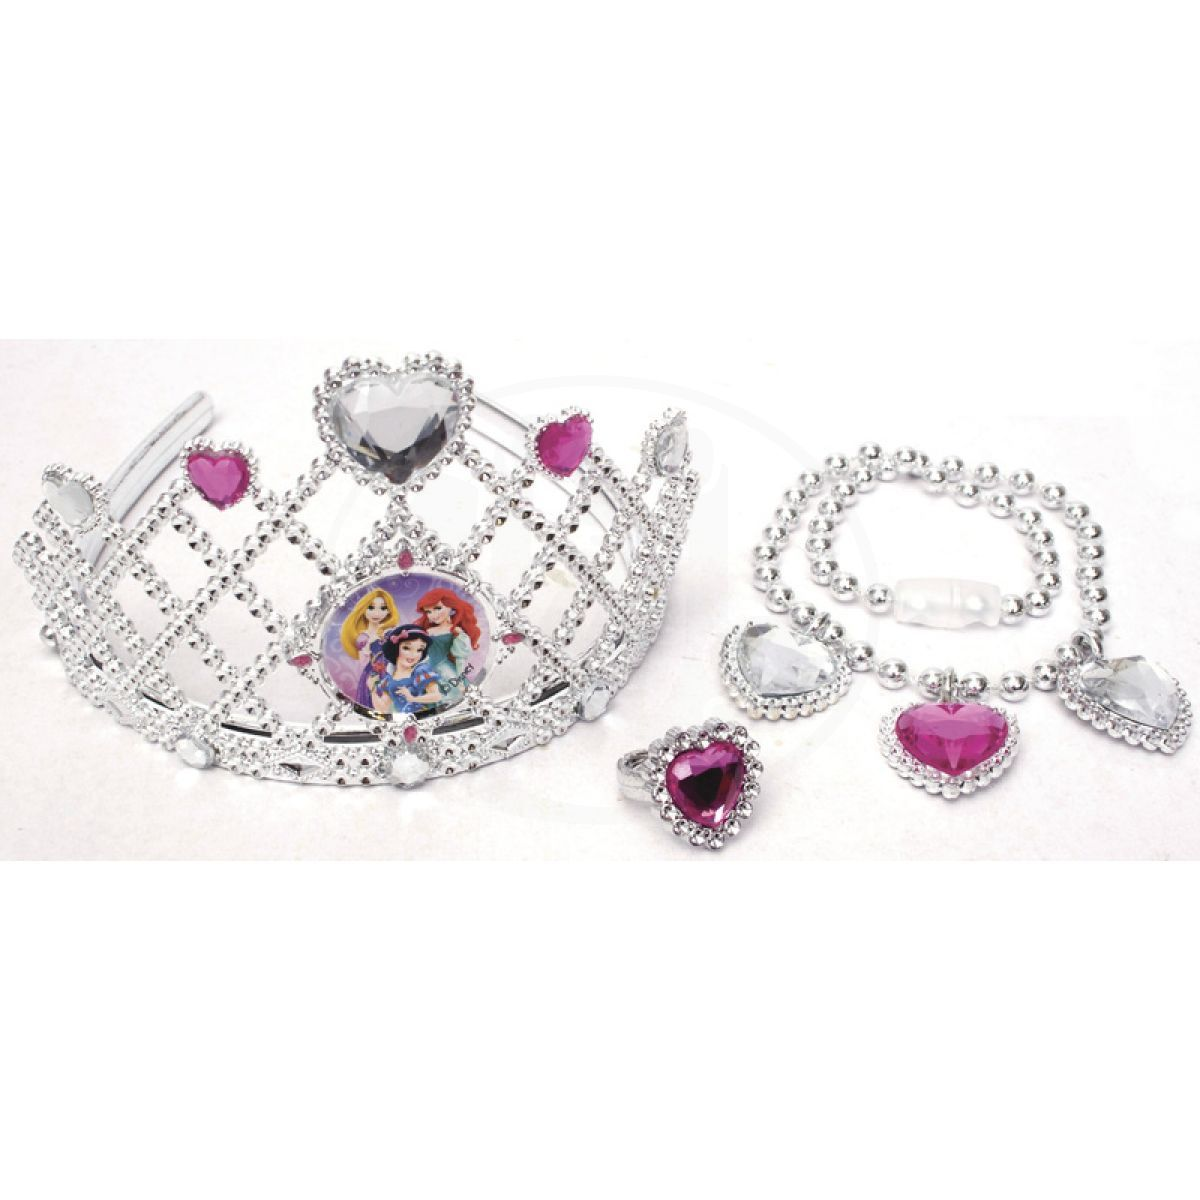 Disney princezny Korunka a šperky pro princeznu 8e232489c2